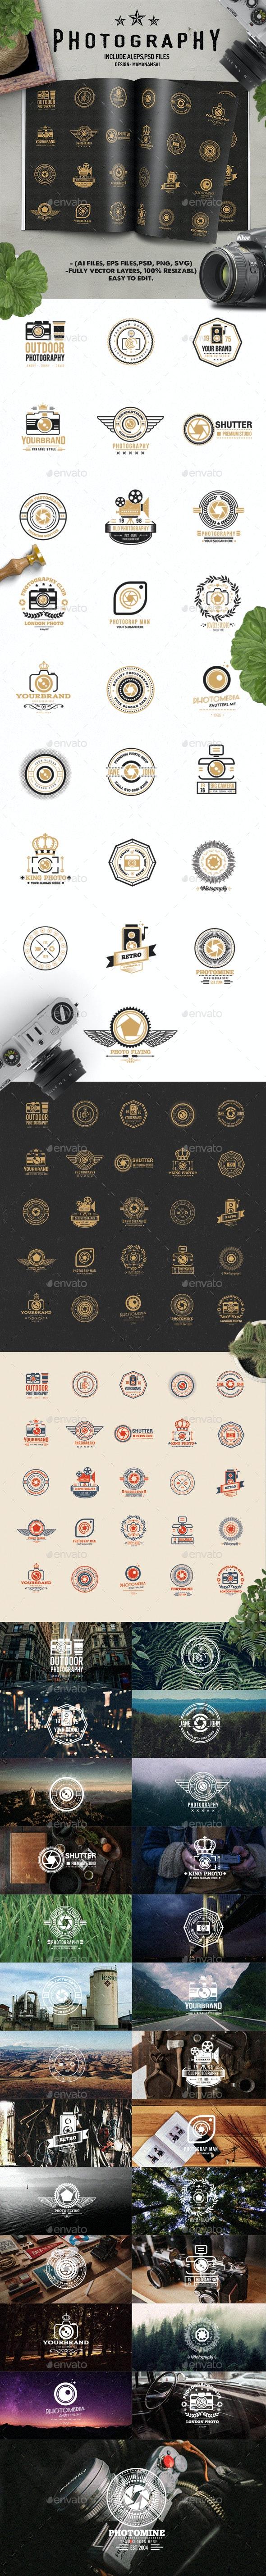 25 Photography Logo Design - Badges & Stickers Web Elements